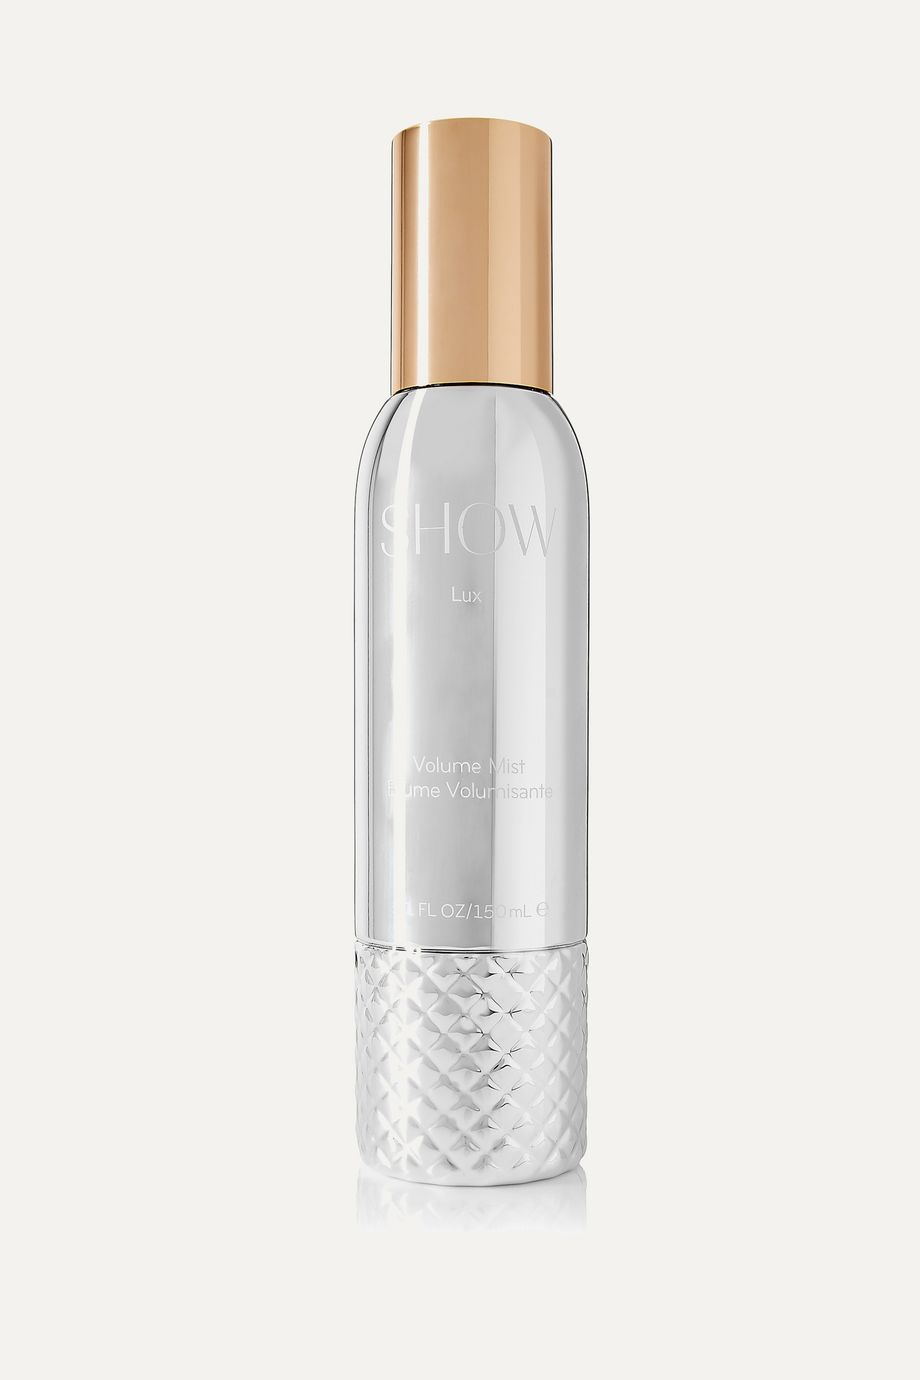 SHOW Beauty Lux Volume Mist, 150ml